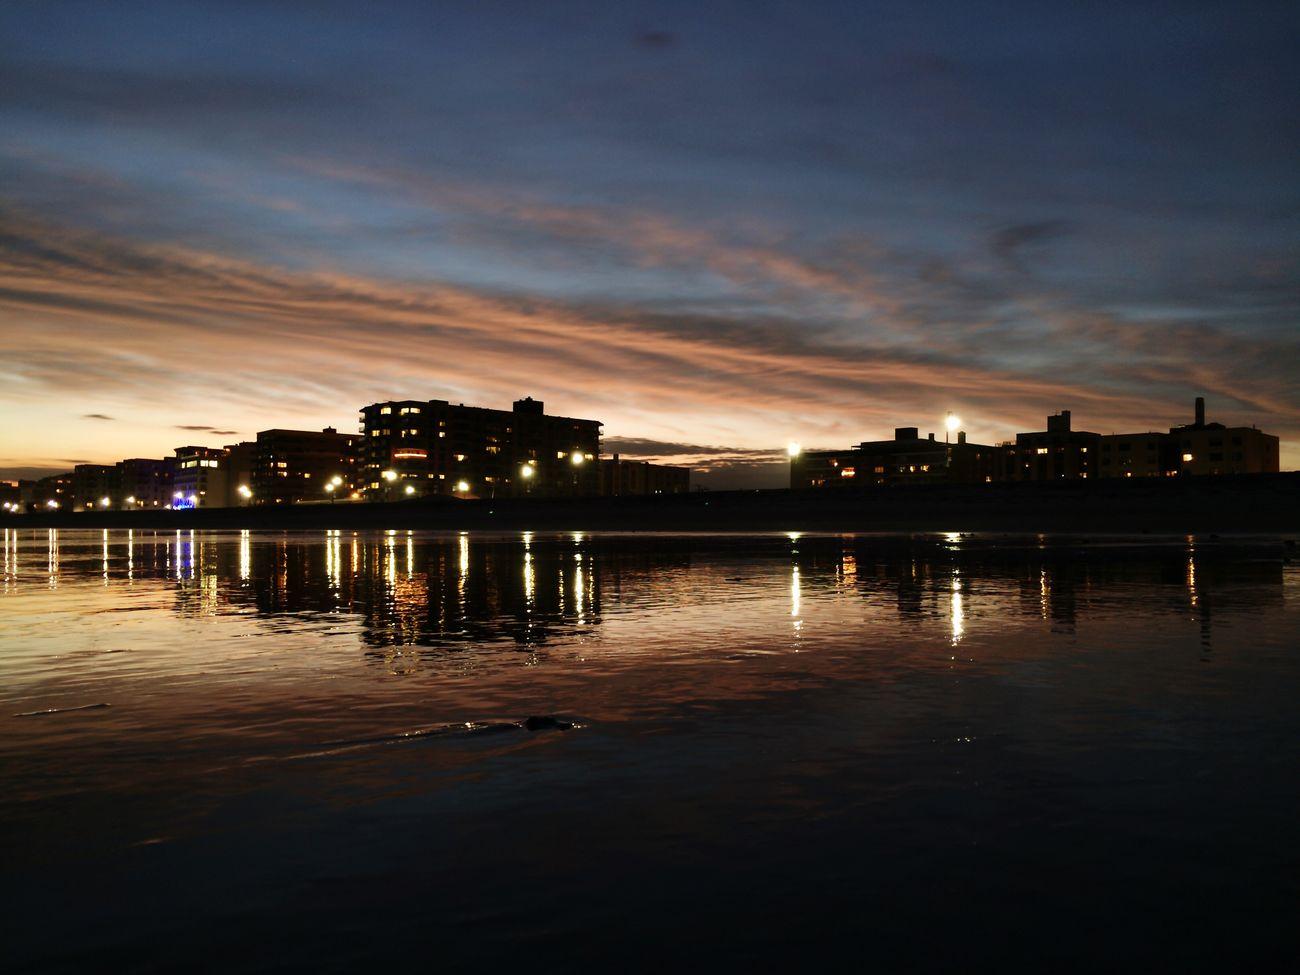 Sunset At Long Beach, NY EyeEm Best Shots Sky Collection Visualmagic Splendid_reflections Sunset_collection Beautiful Sky Popular Photos Beachphotography Long Island NY